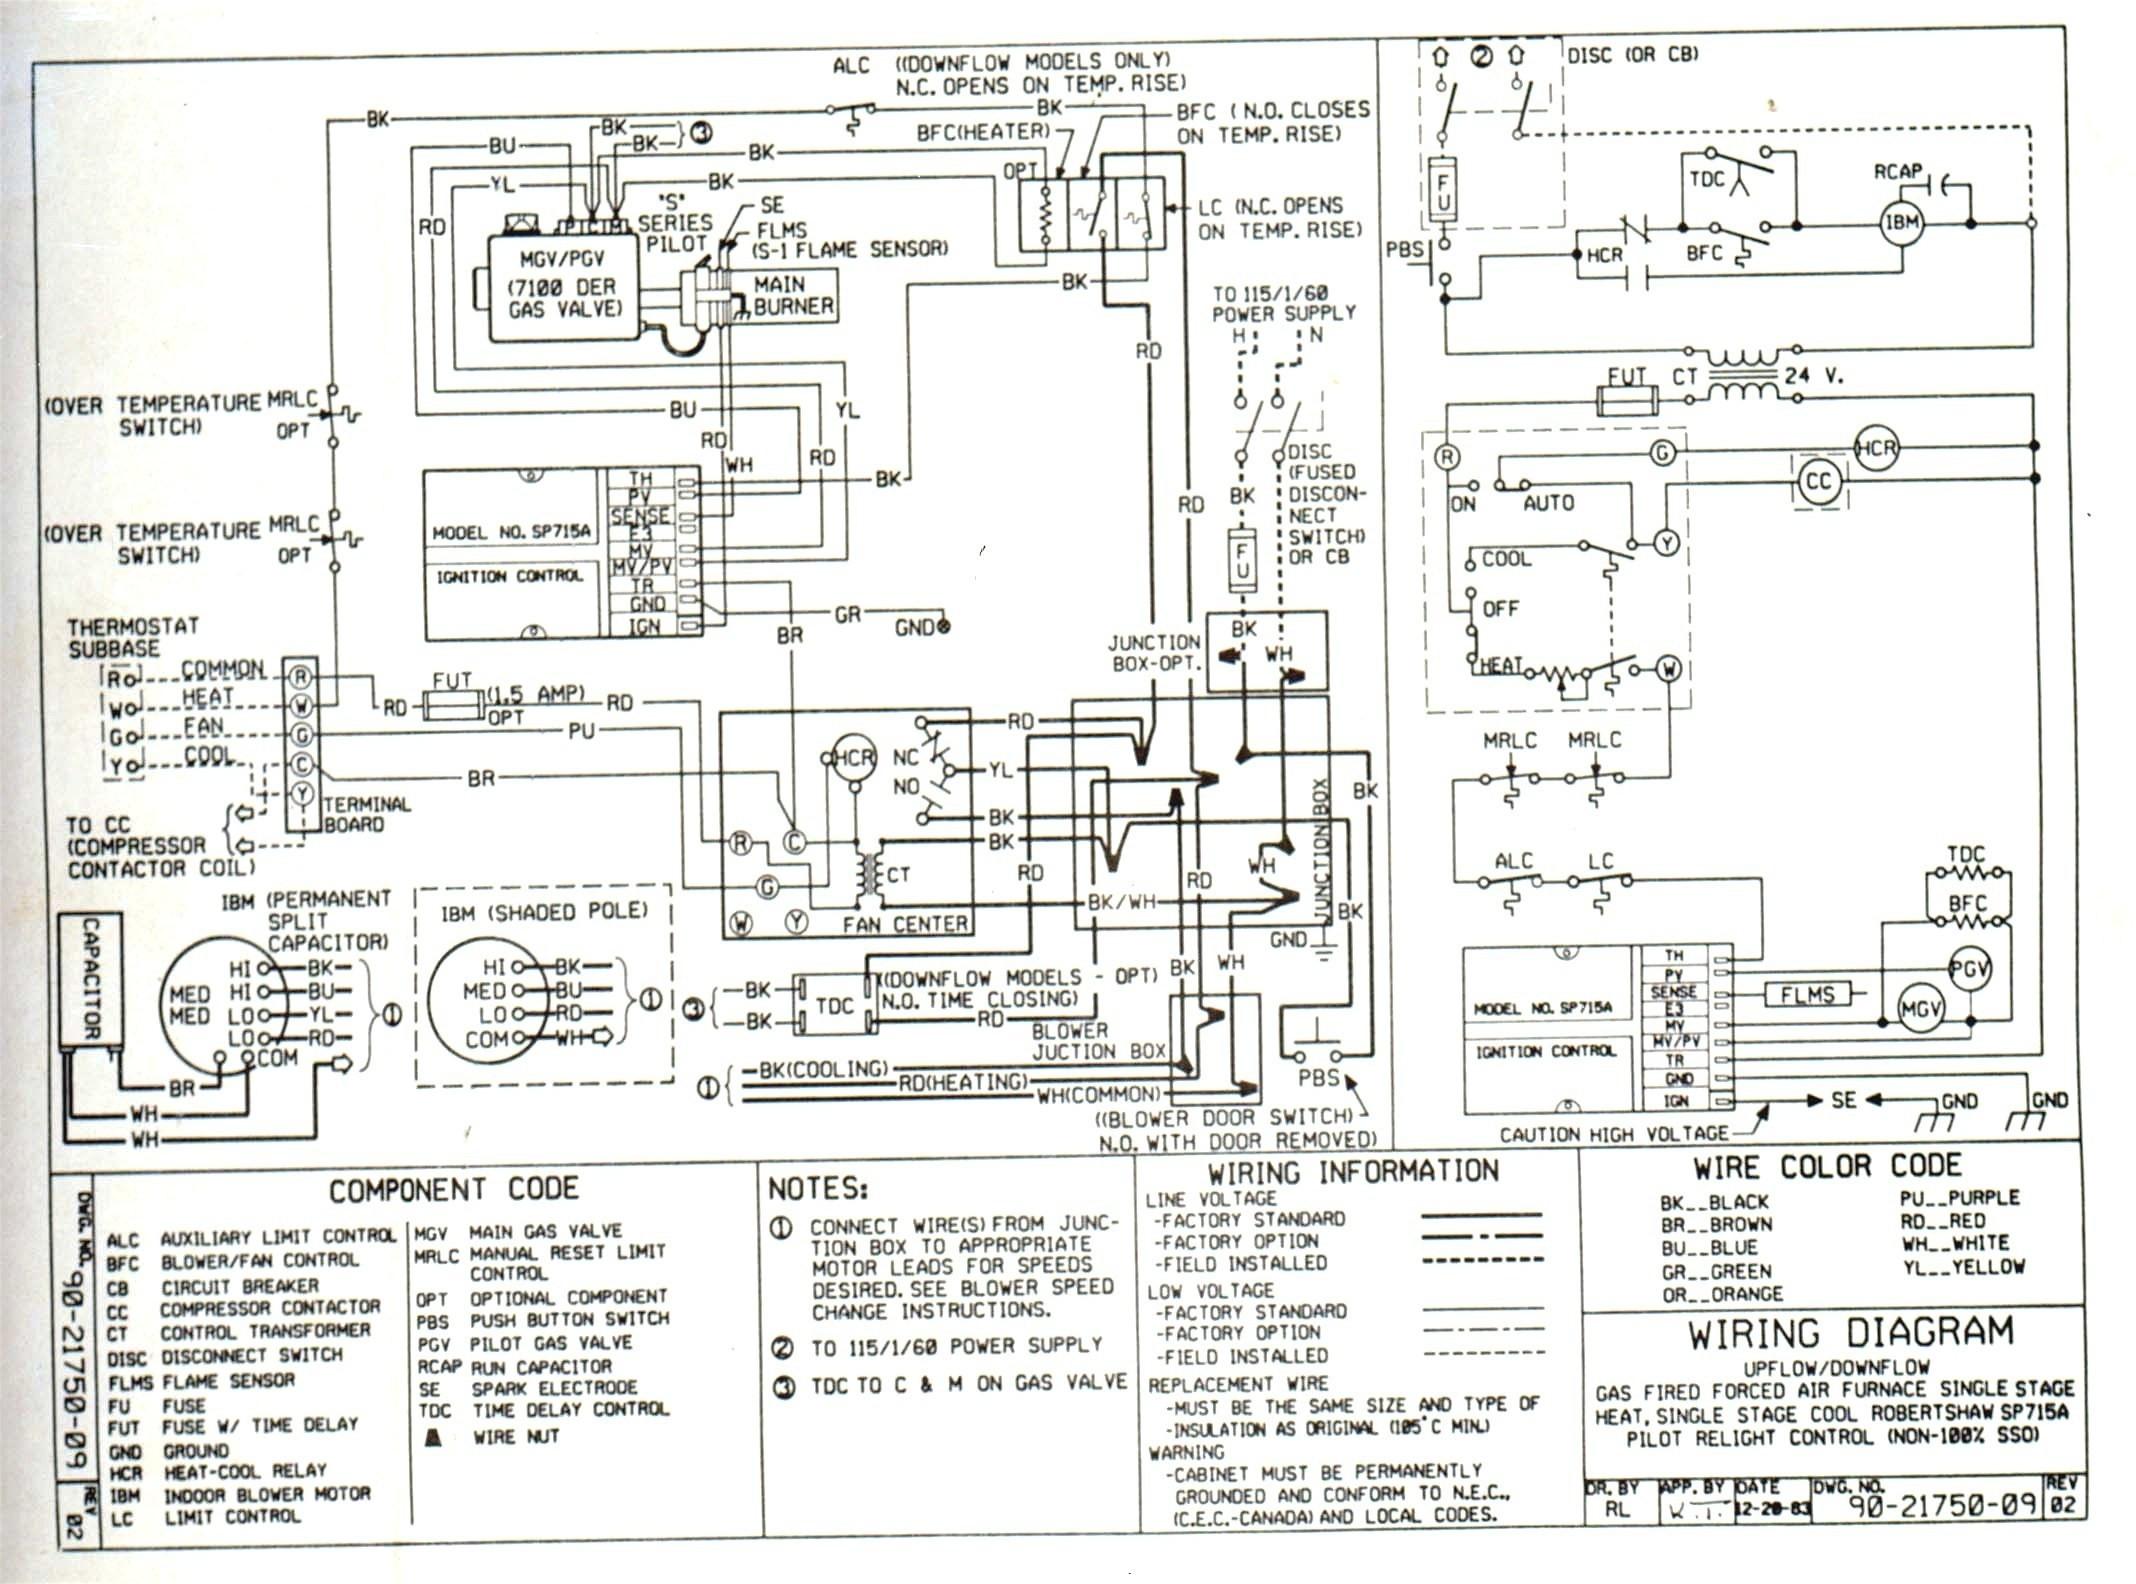 4020 12 Volt Wiring Diagram F287 115v Breaker Wiring Diagram Free Picture Schematic Of 4020 12 Volt Wiring Diagram